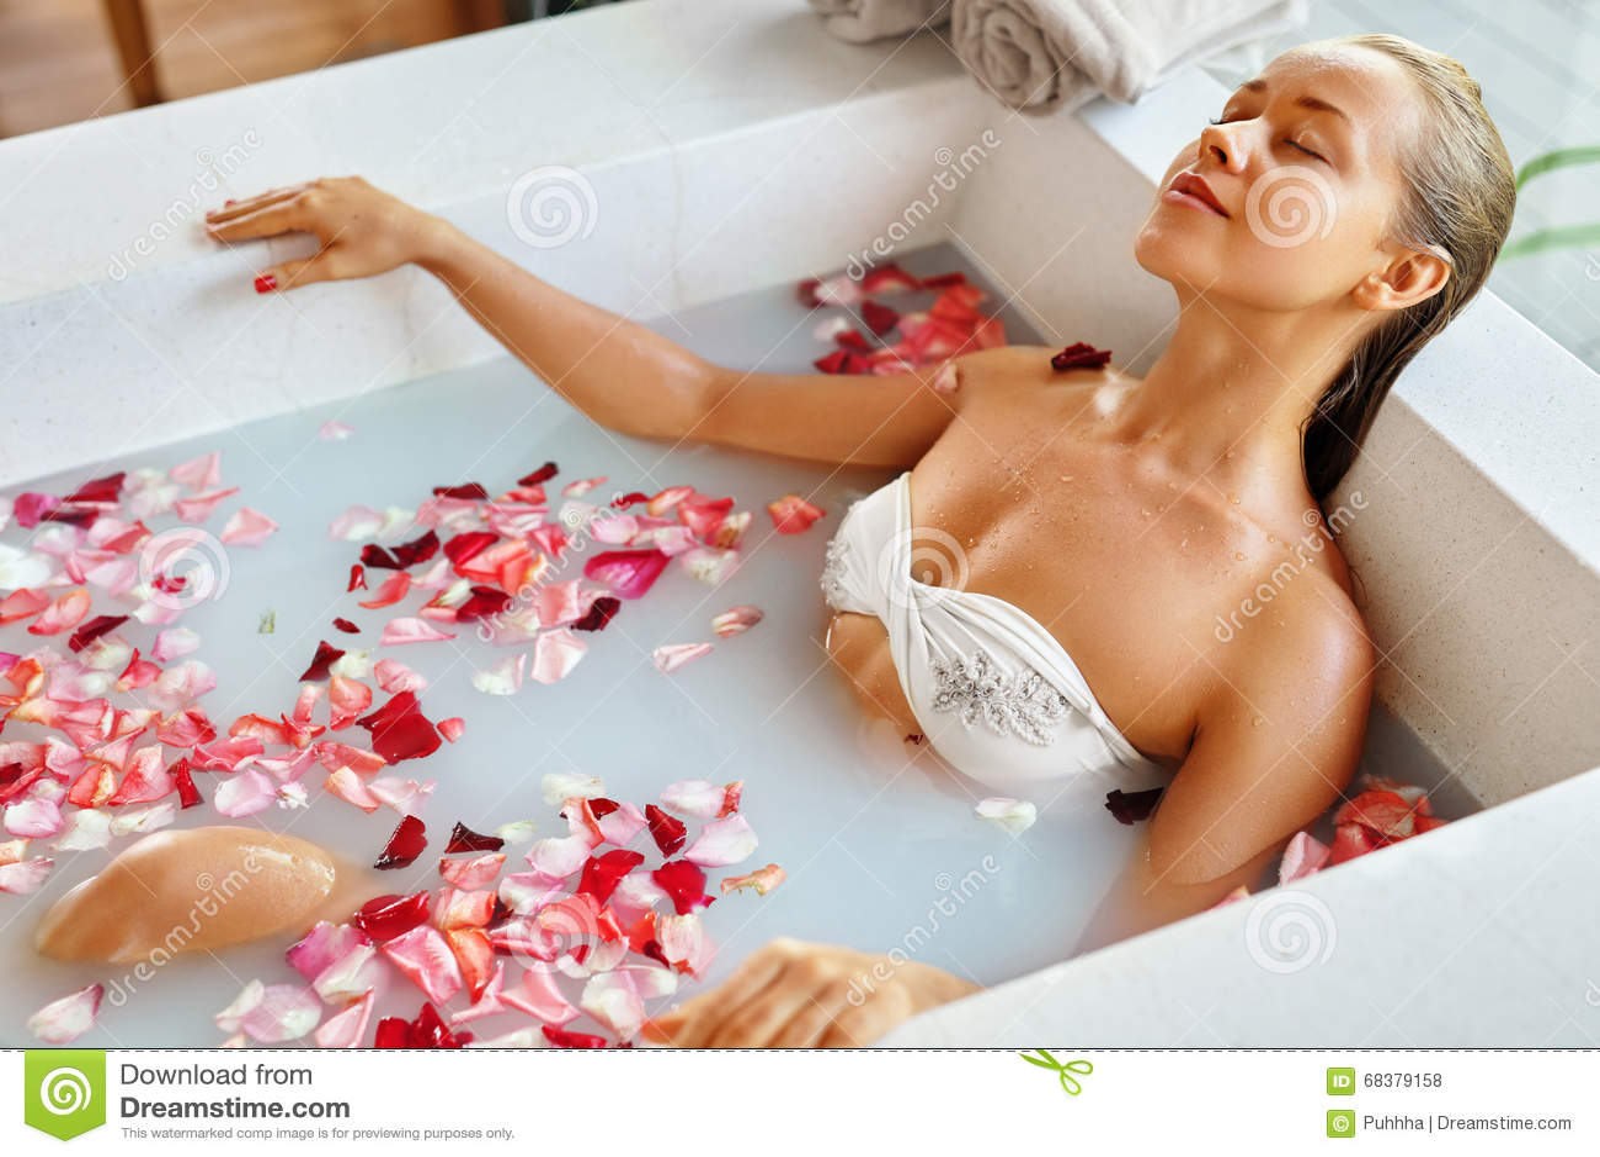 da619c6670995 spa-relaxation-woman-body-care-flower-bath-beauty-skincare-beautiful -sexy-caucasian-blonde-girl-bikini-lying-resort-day-68379158.jpg